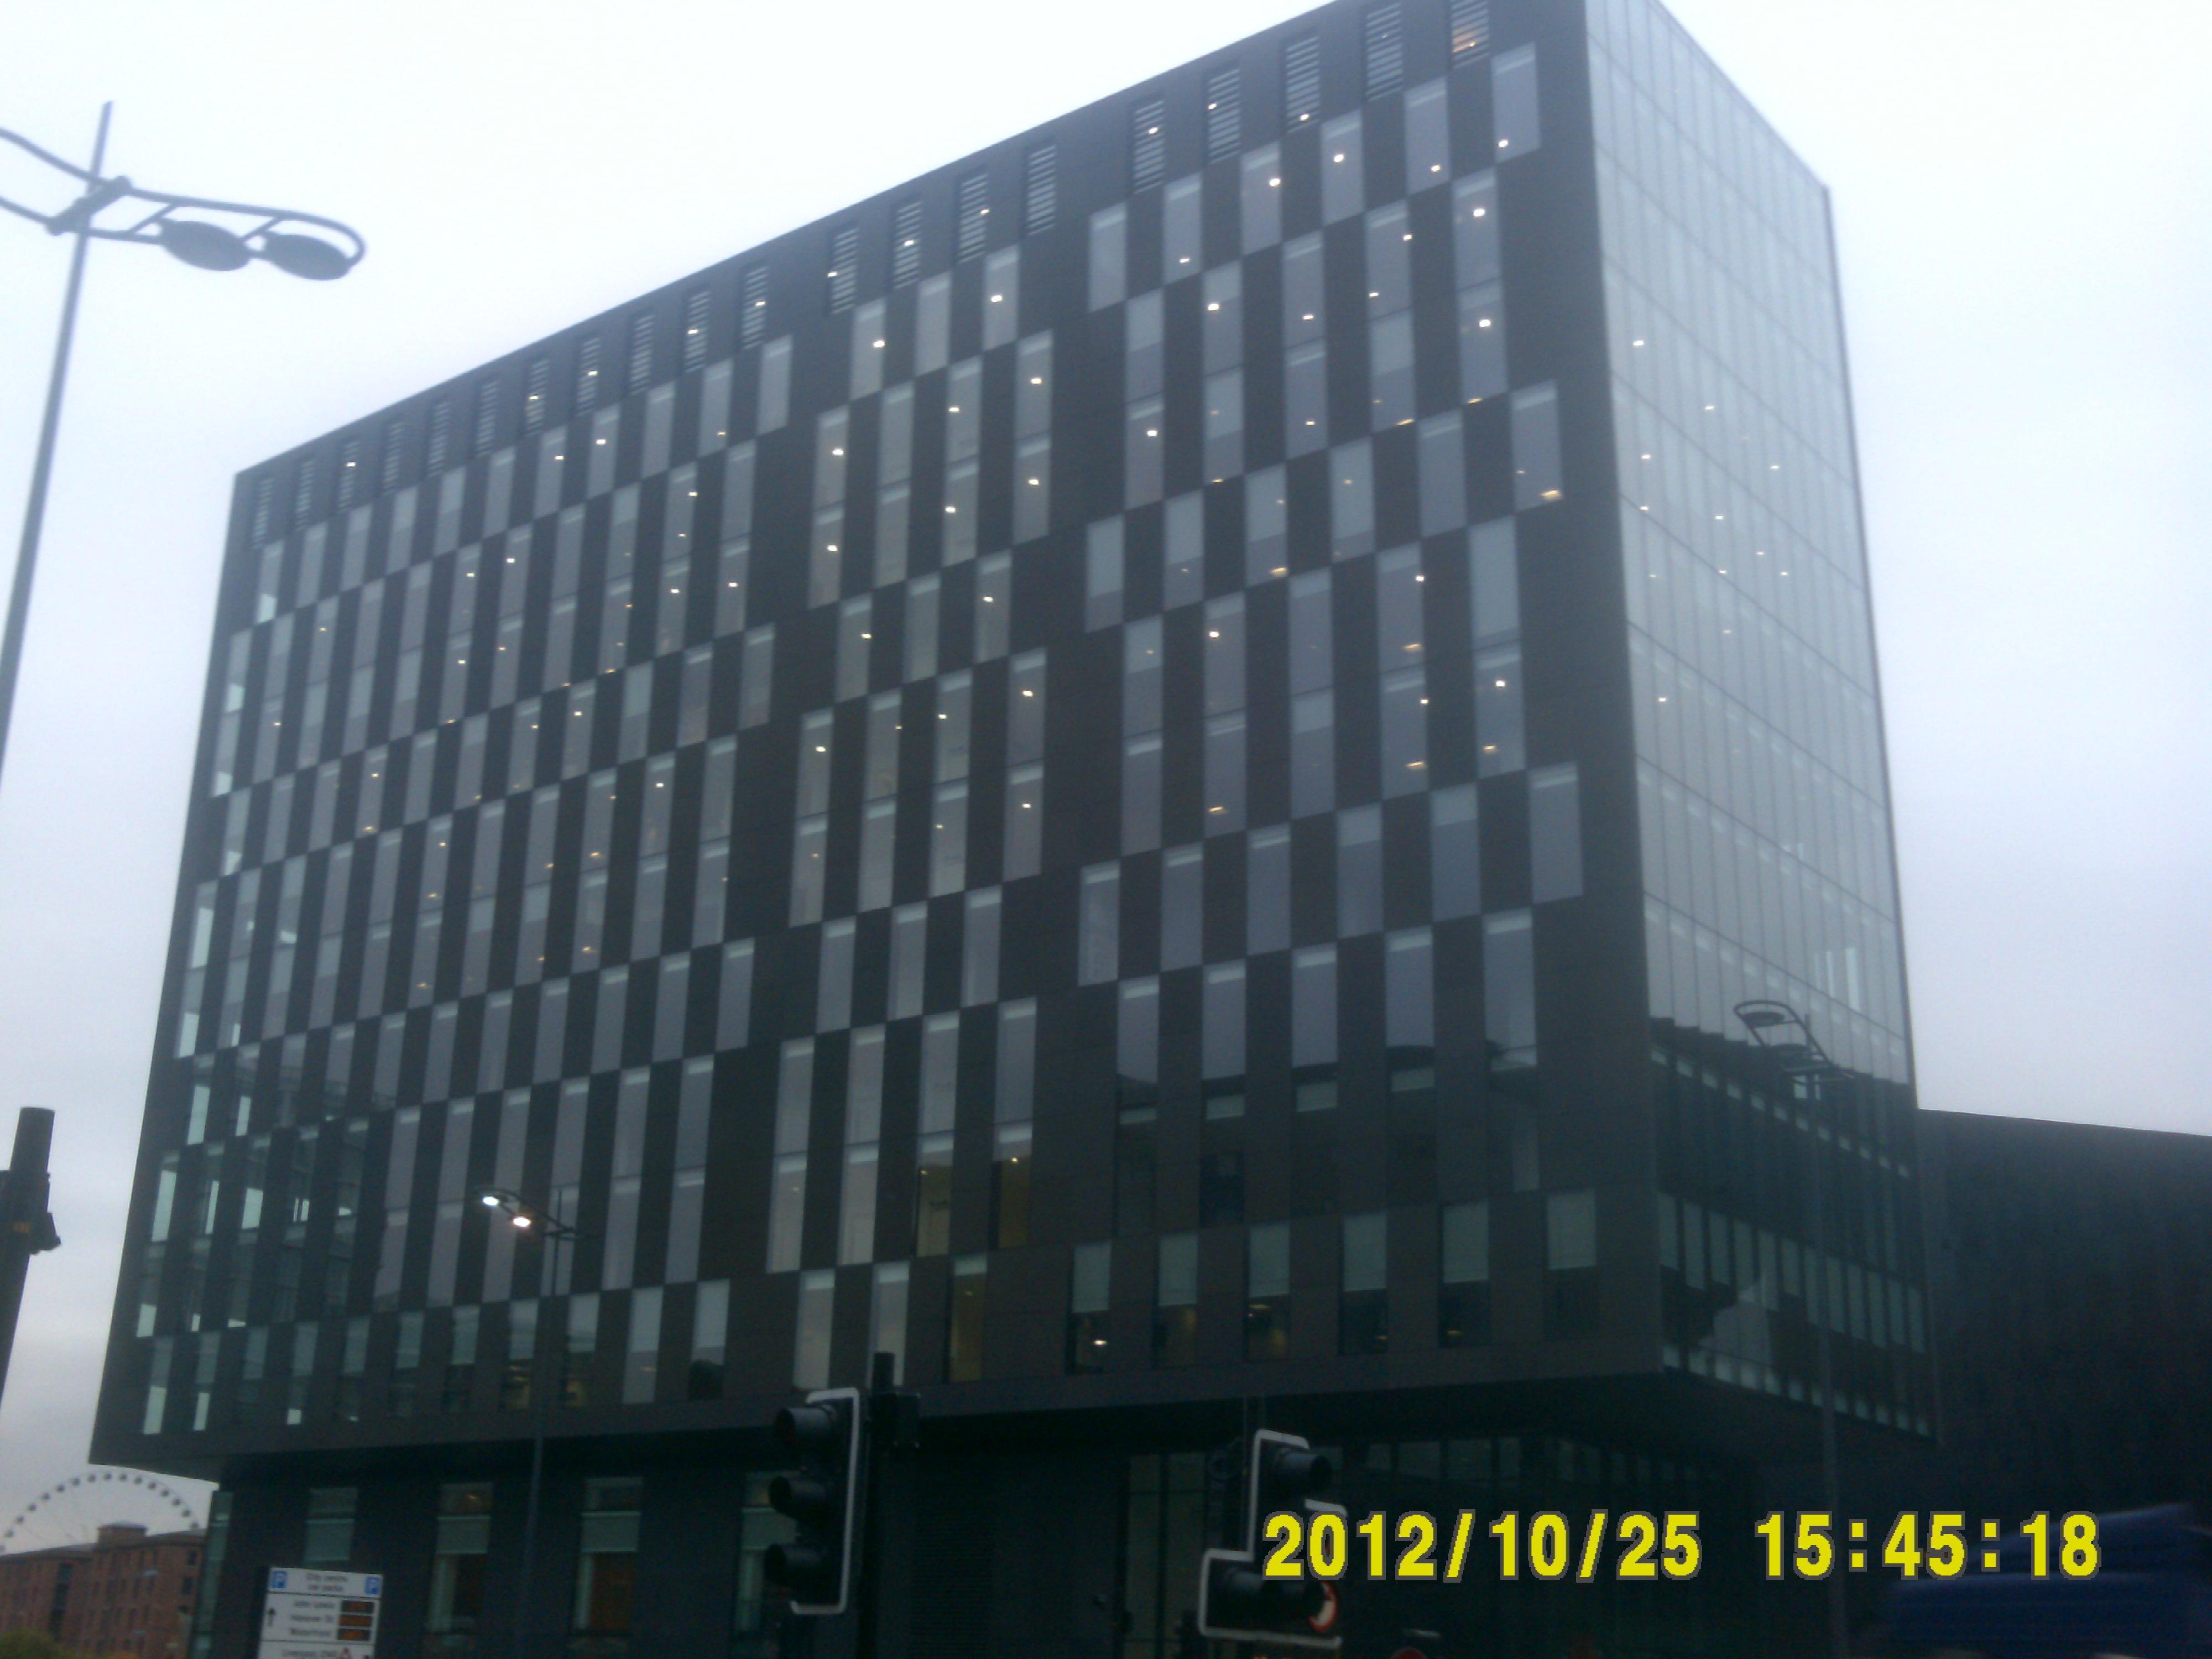 Merseytravel (Merseyside Integrated Transport Authority) Headquarters, No. 1 Mann Island, Liverpool